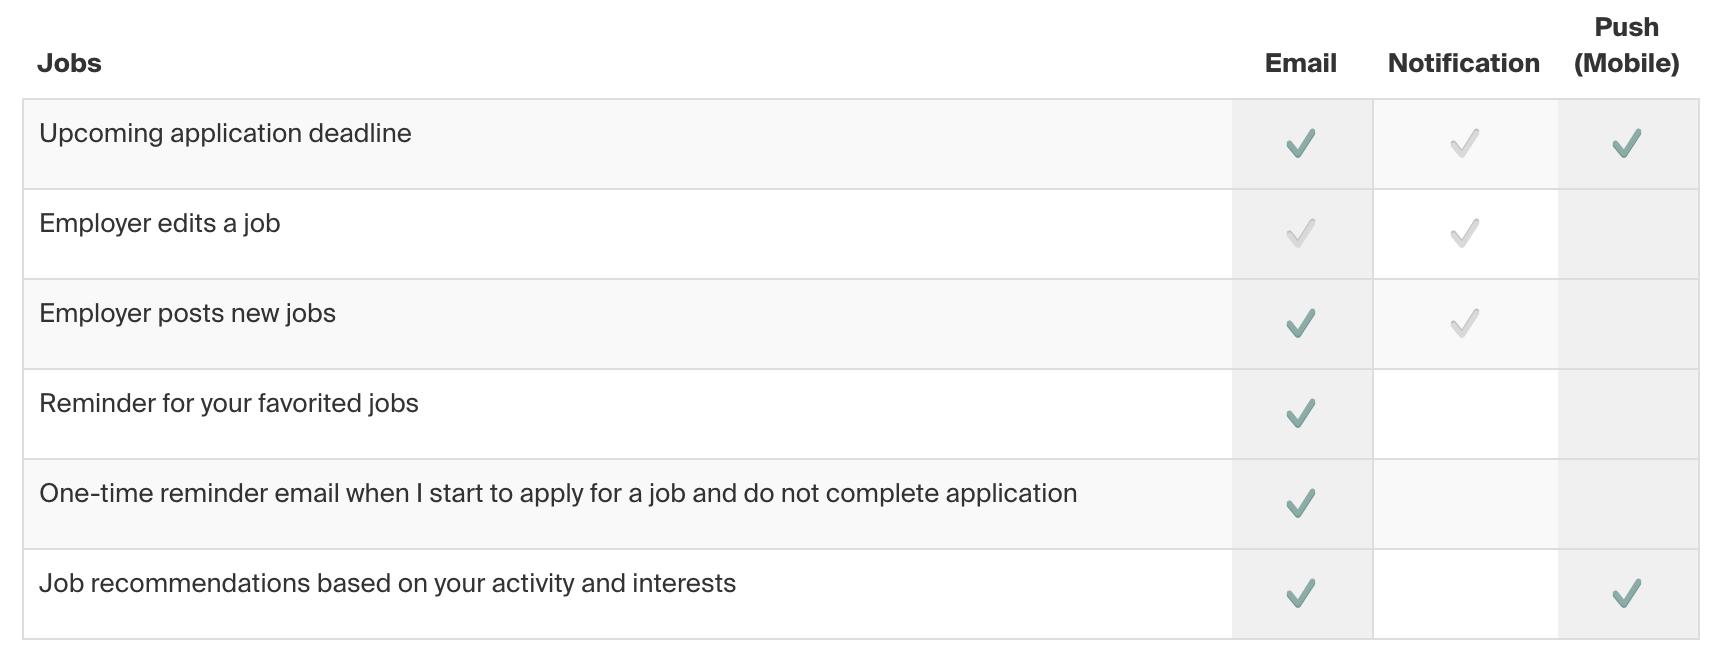 jobs_notifications.png